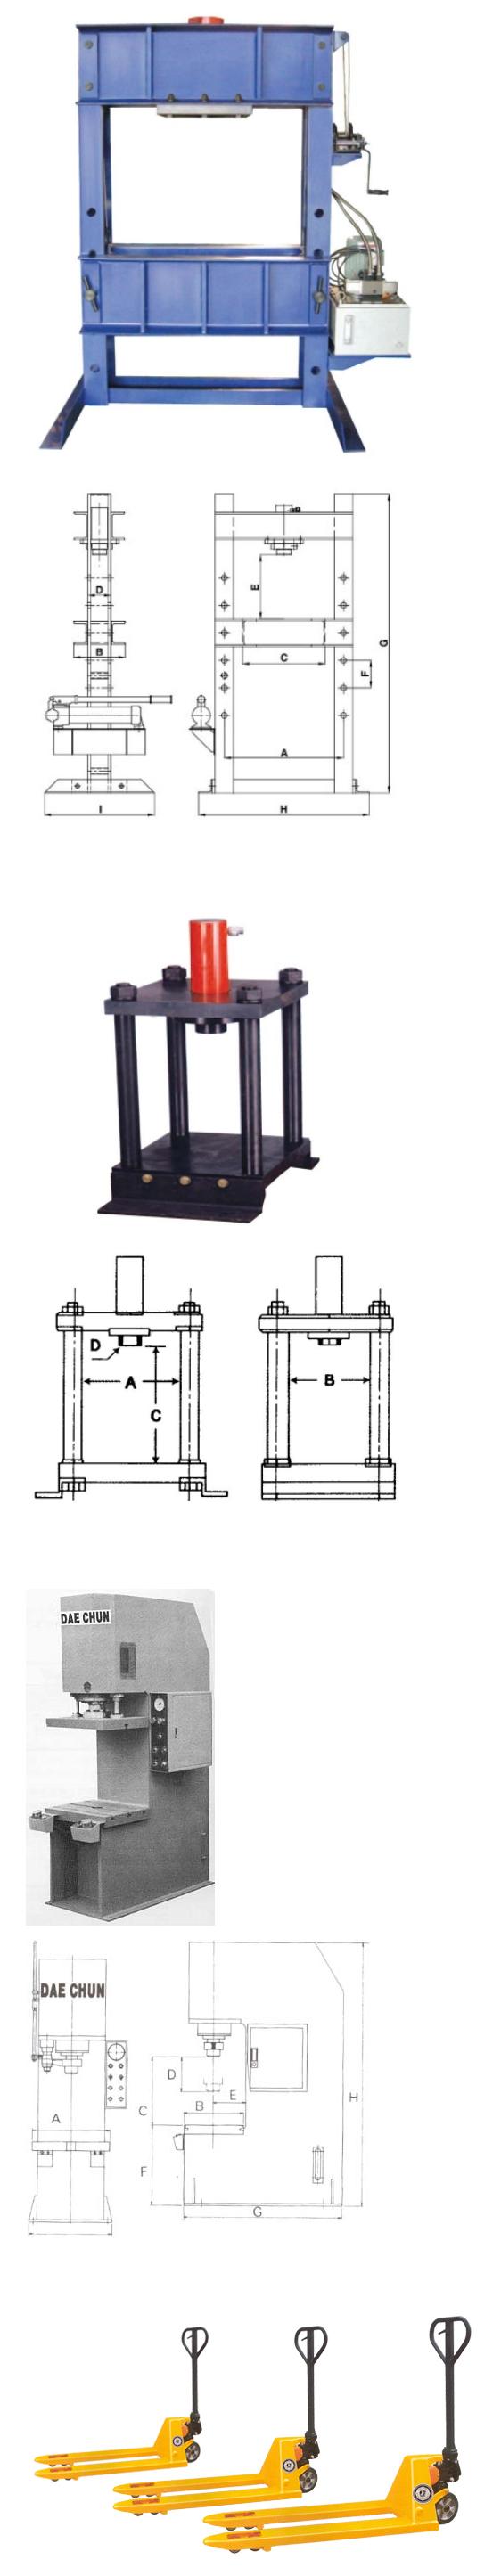 Daechun Hydraulic Machinery Other tools